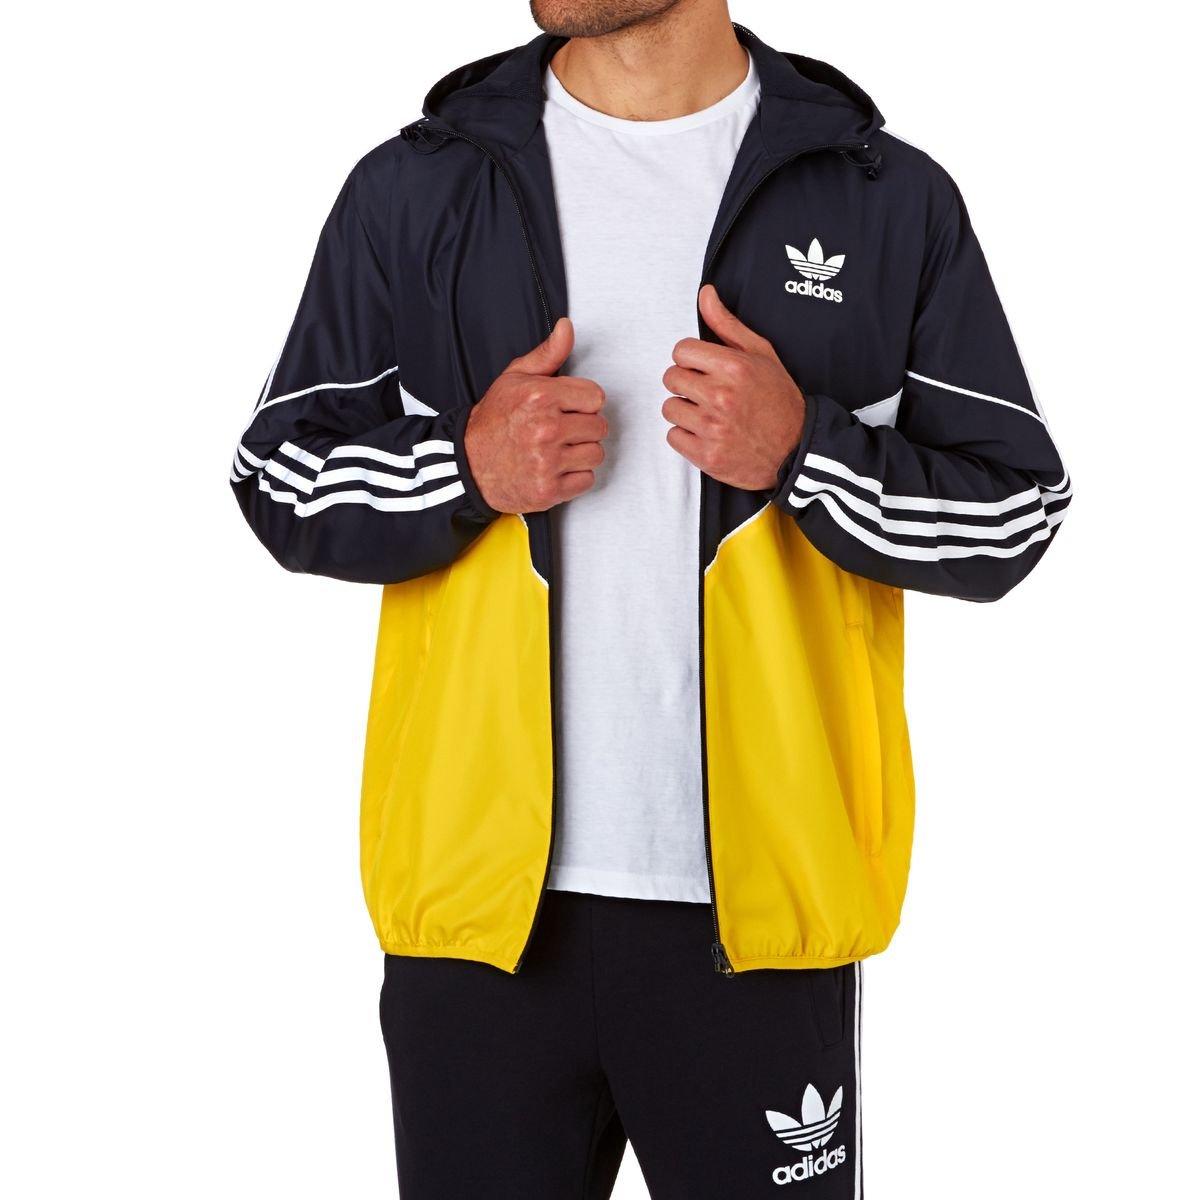 Großhandelspreis adidas Originals Linear Windbreaker Jacken